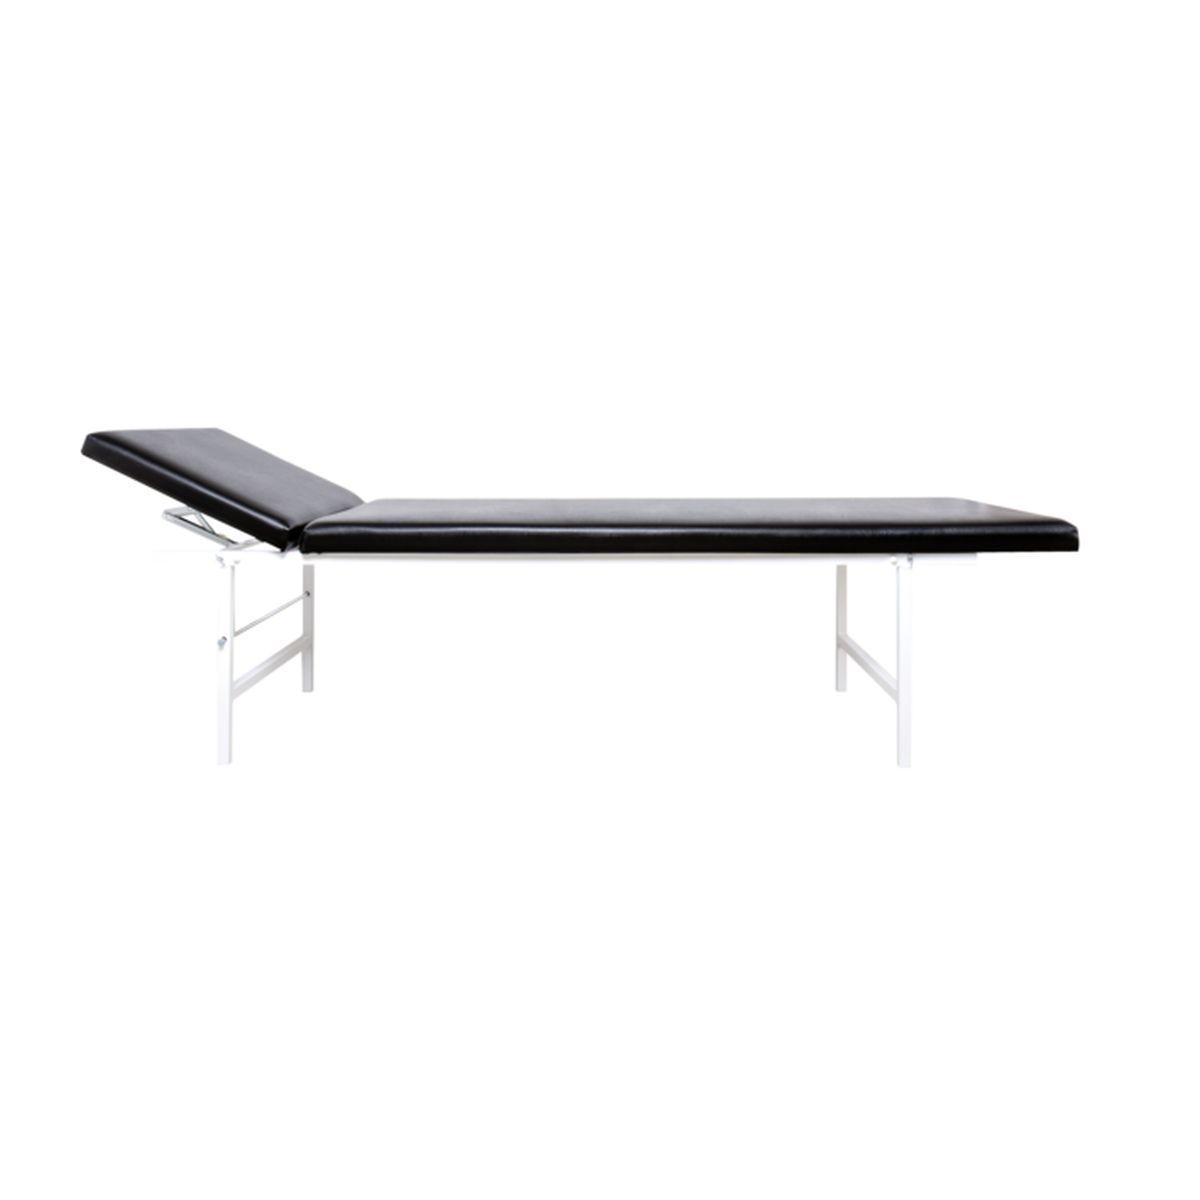 ruheraumliege stahlrohr kopfteil verstellbar natur online. Black Bedroom Furniture Sets. Home Design Ideas